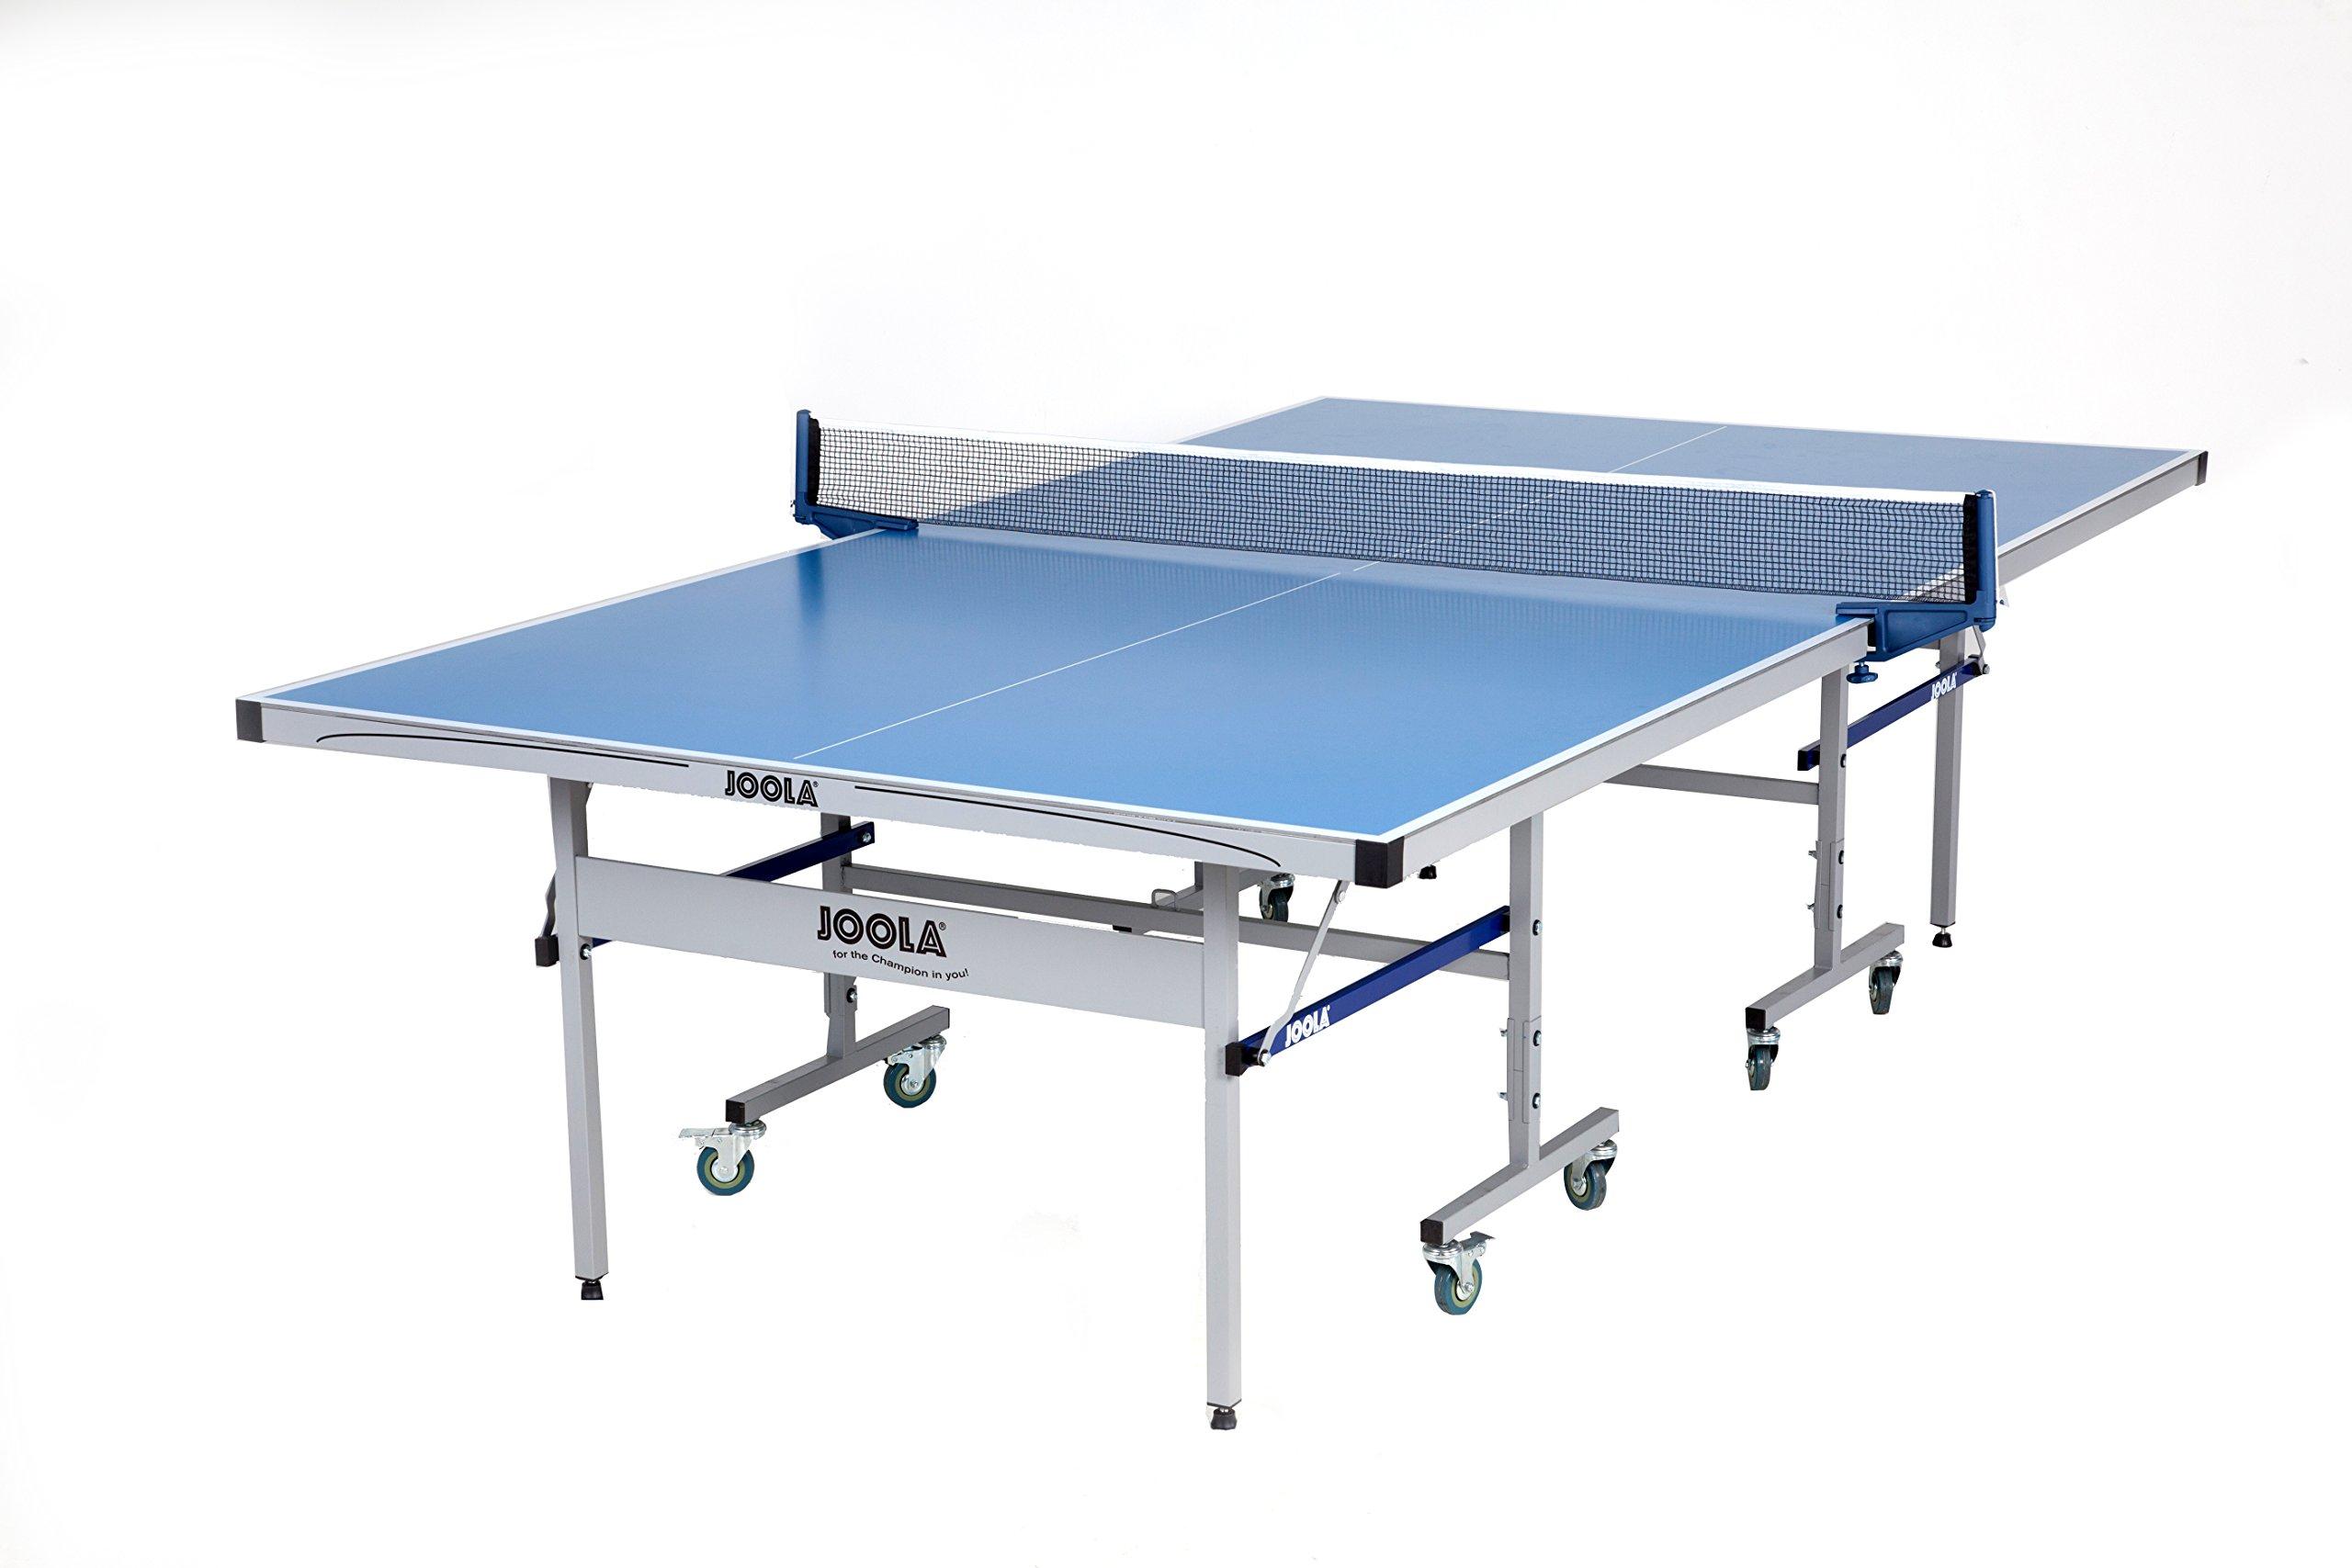 JOOLA Nova DX Outdoor/Indoor All-Weather Table Tennis Table